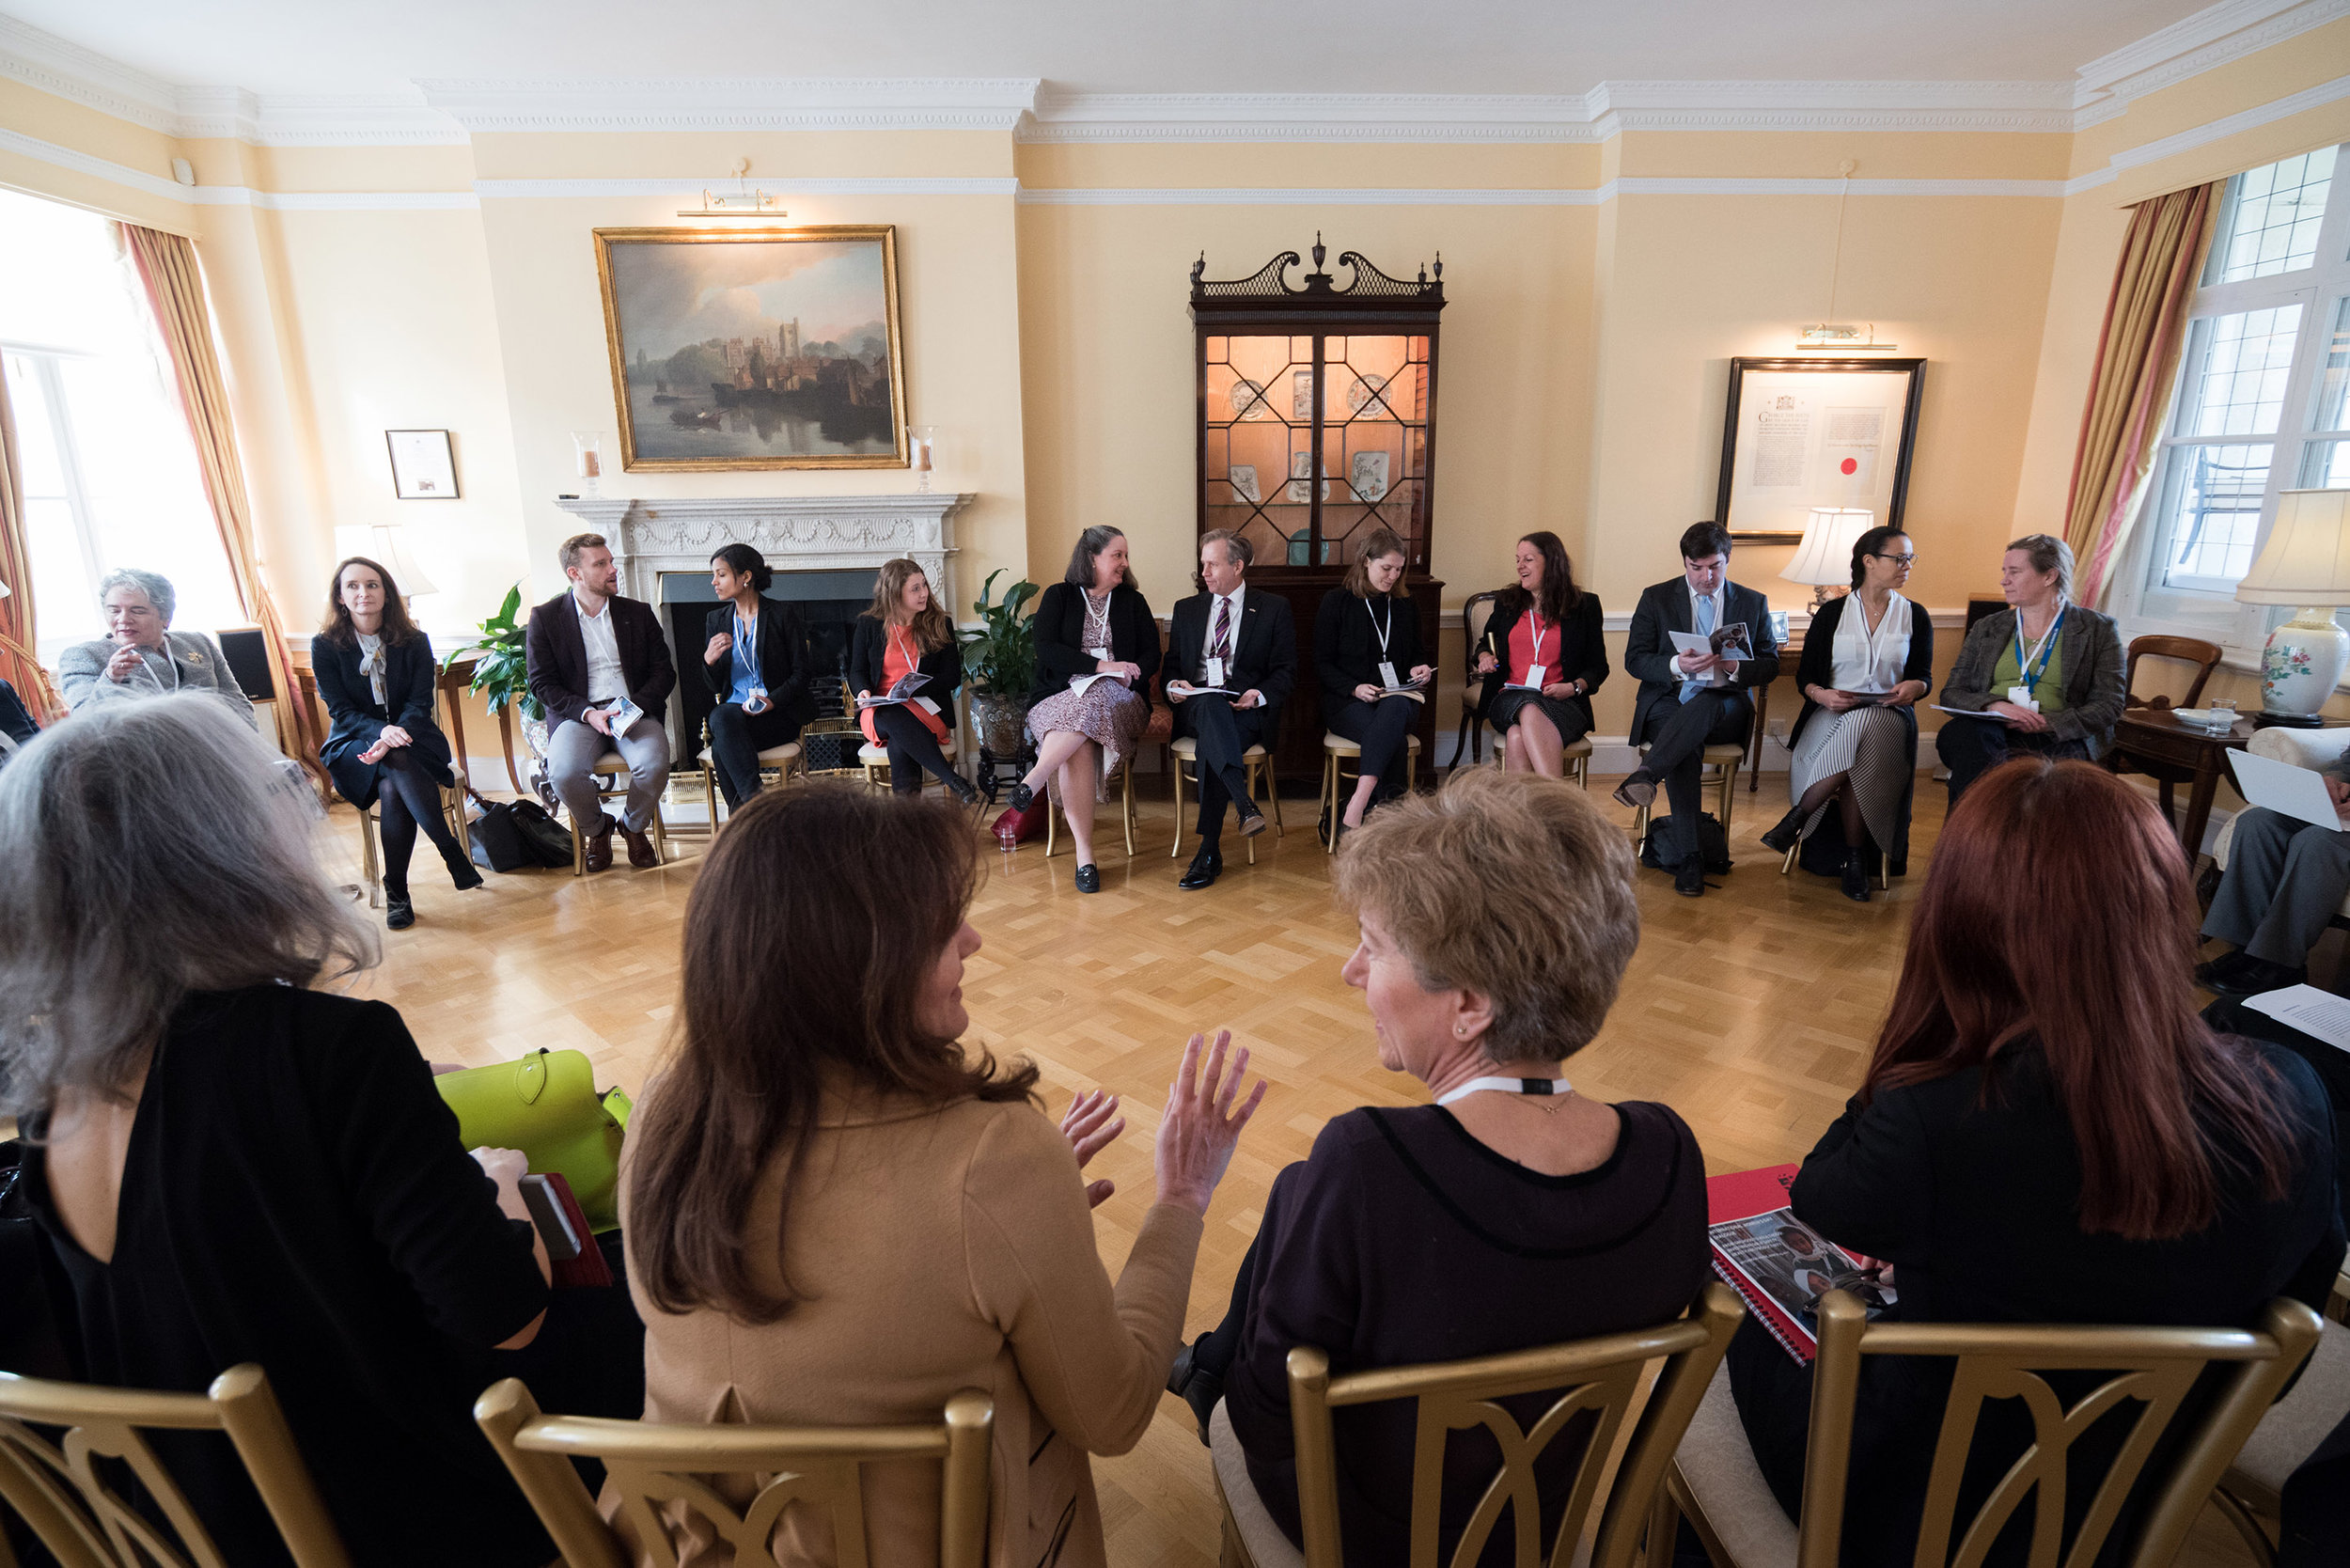 ICRW - Advancing gender equality